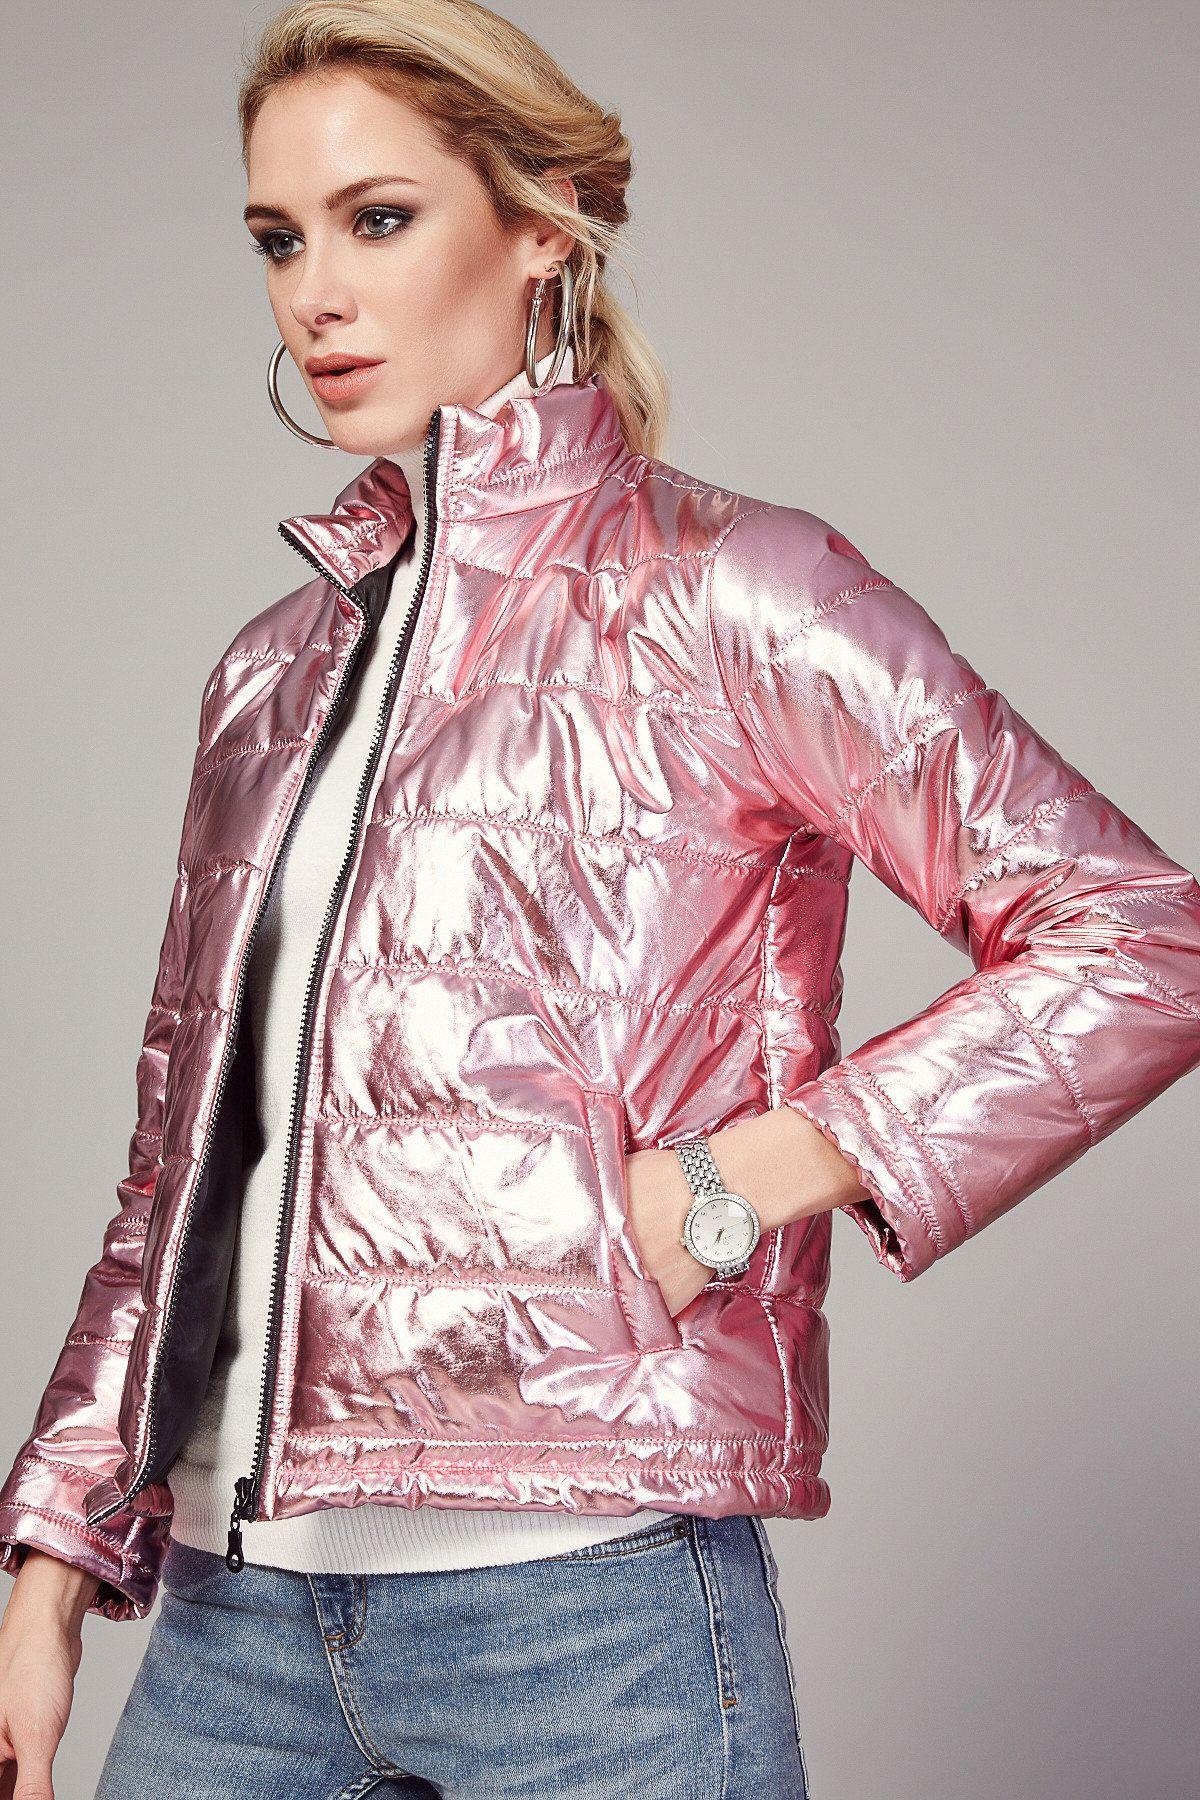 Metallic Puffer Jacket Mont Moda Stilleri Trendler [ 1800 x 1200 Pixel ]